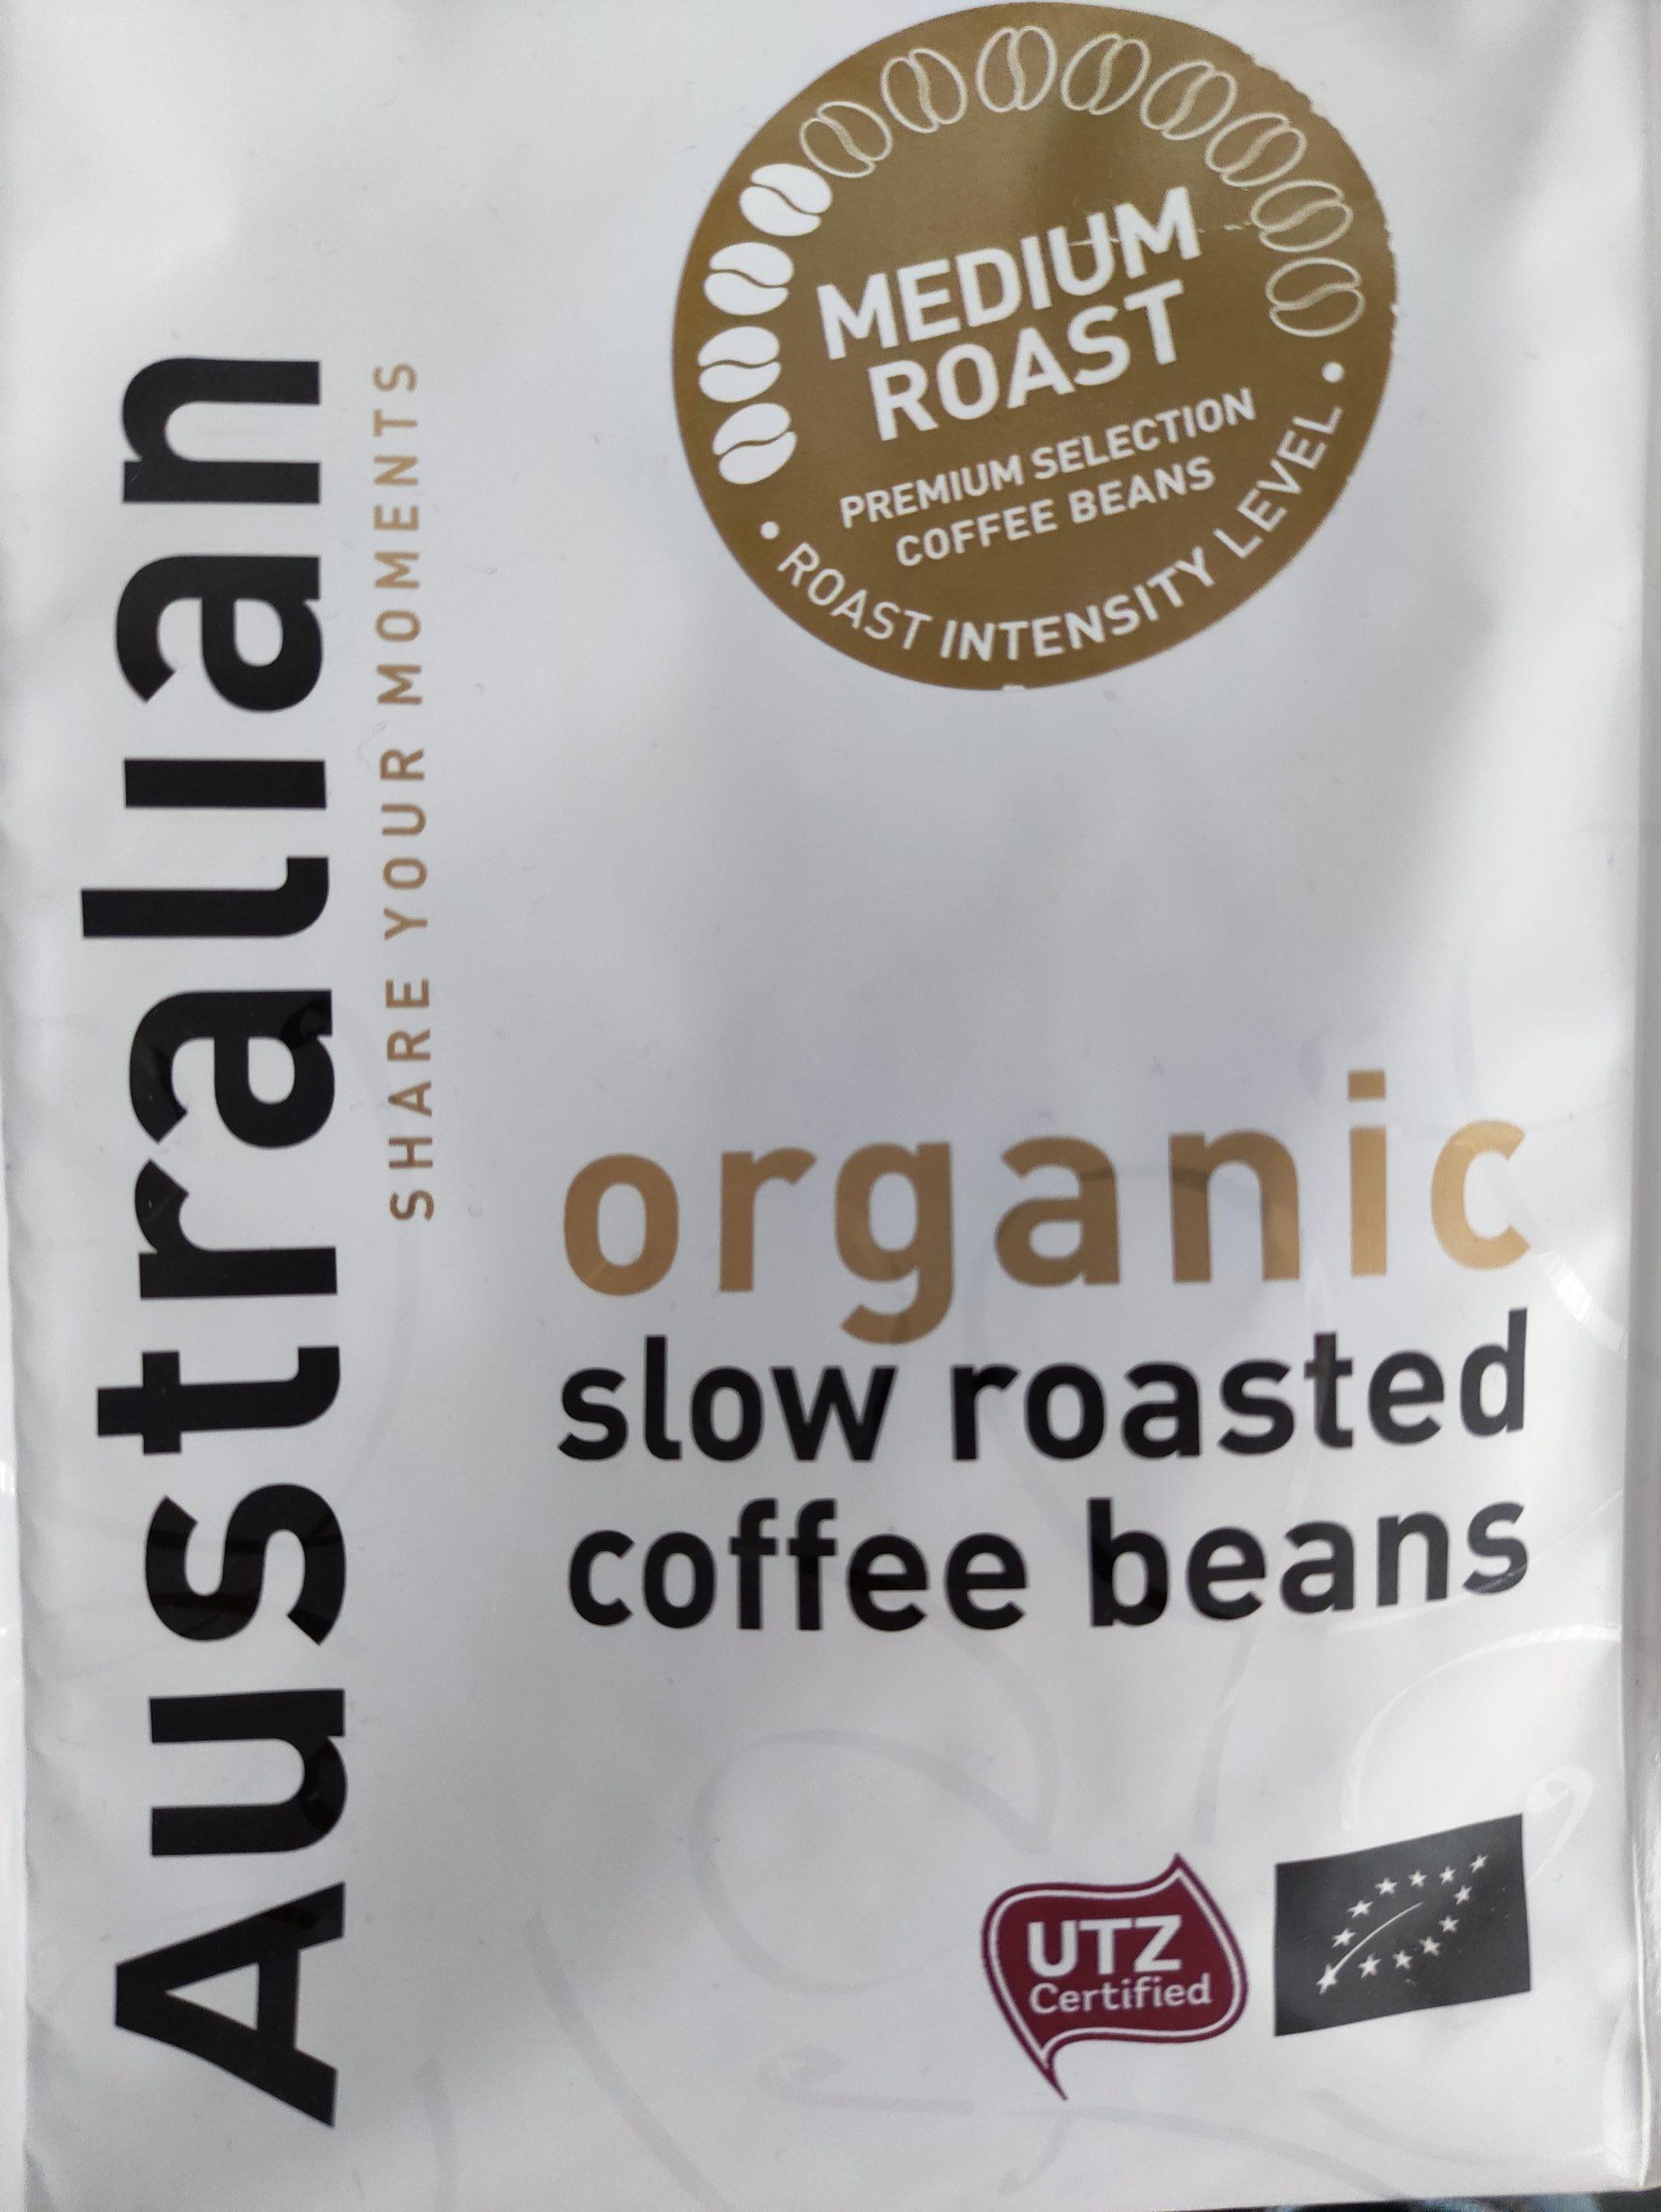 Australian - Coffee Beans medium roast - Review